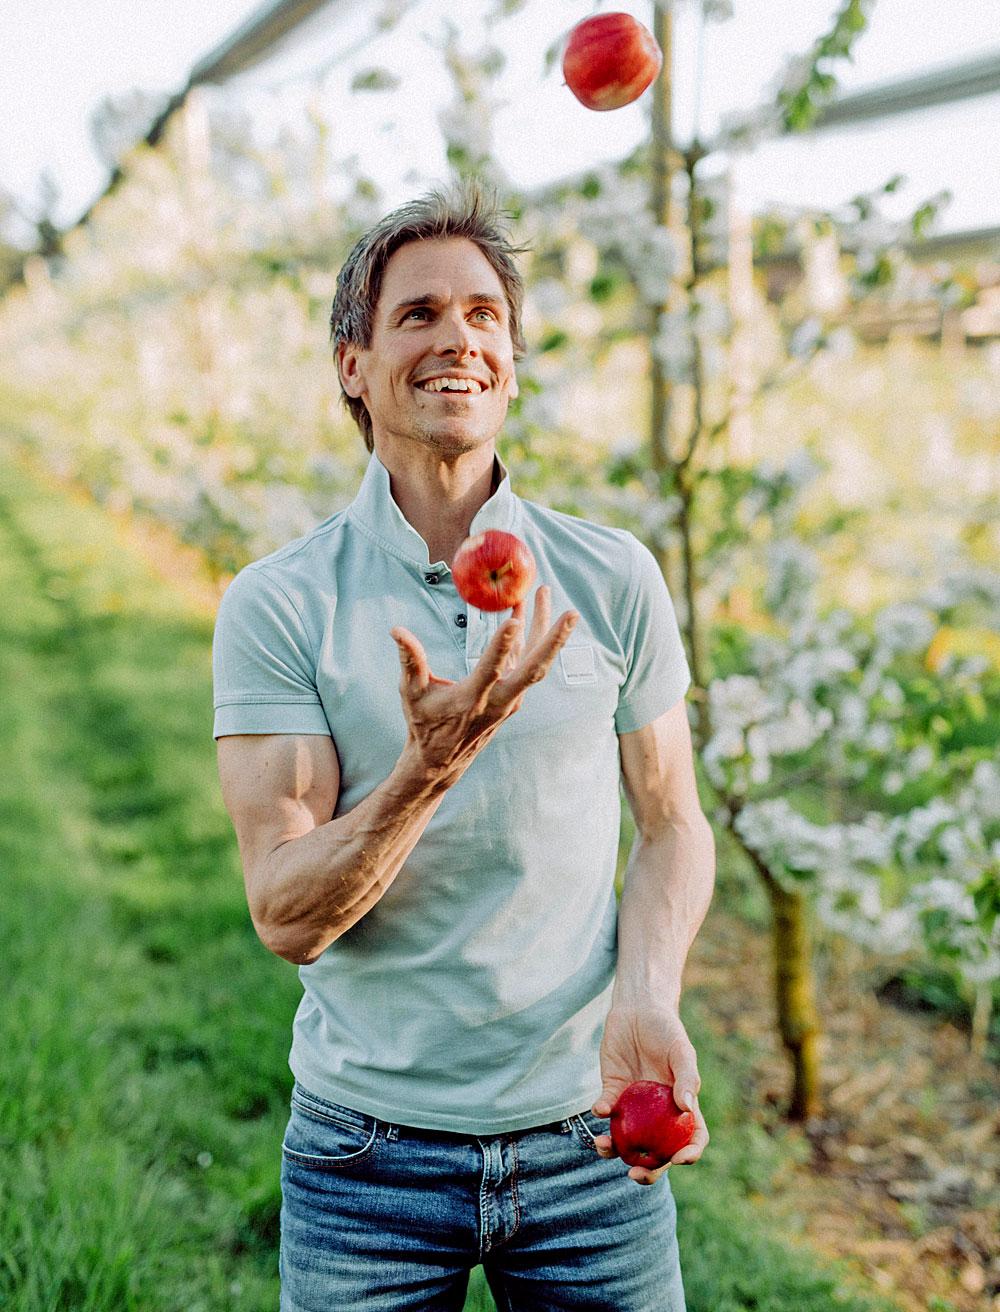 Olympiasieger Felix Gottwald beim Jonglieren mit Äpfeln